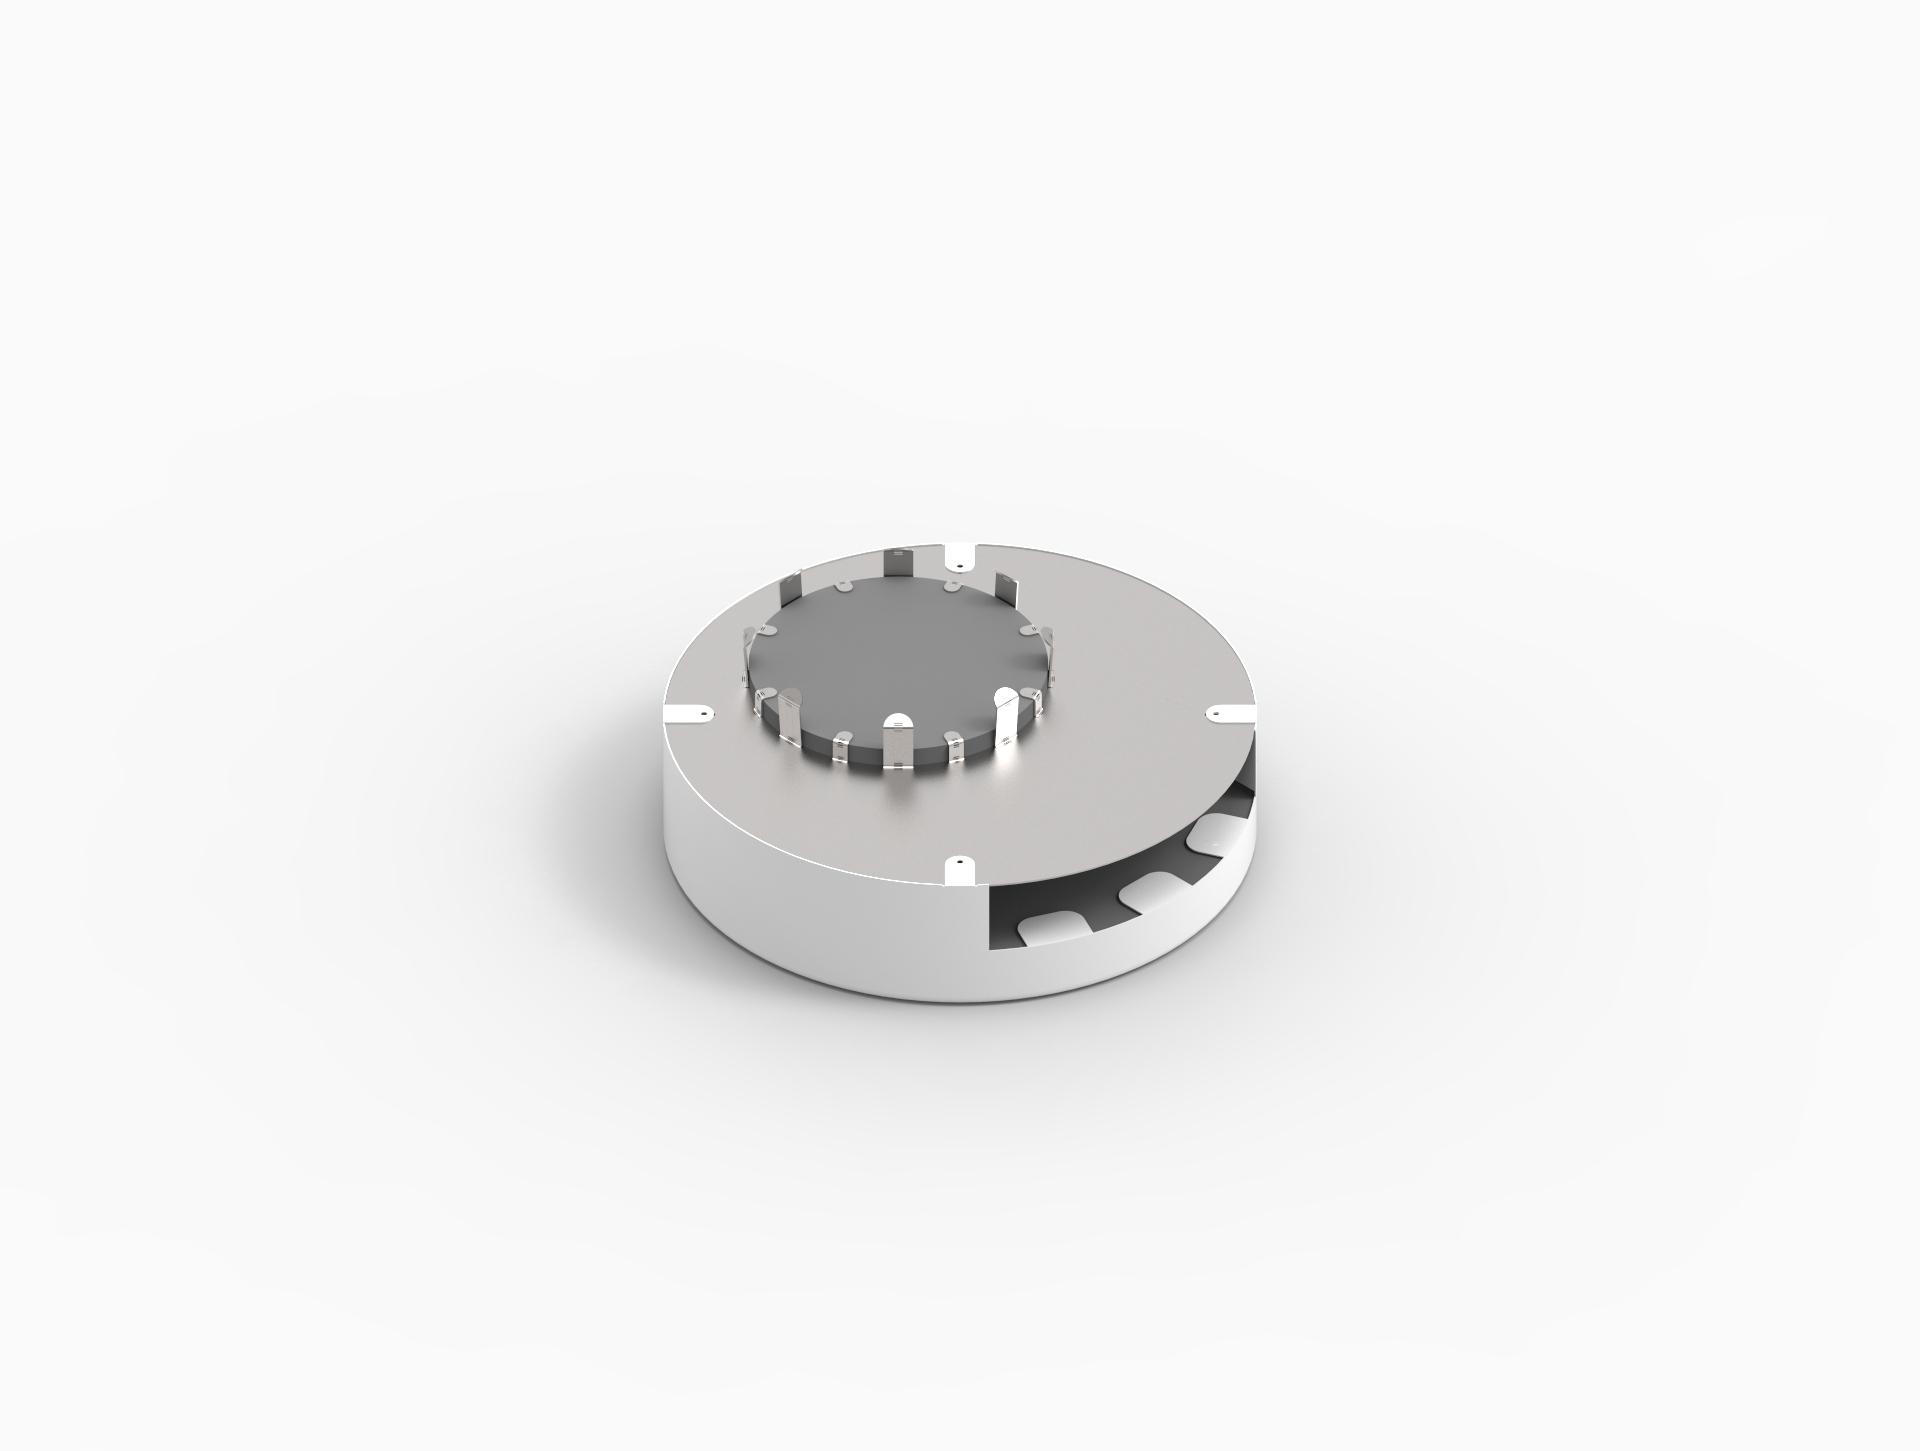 Smygin Akustik Puck ventilationsdon